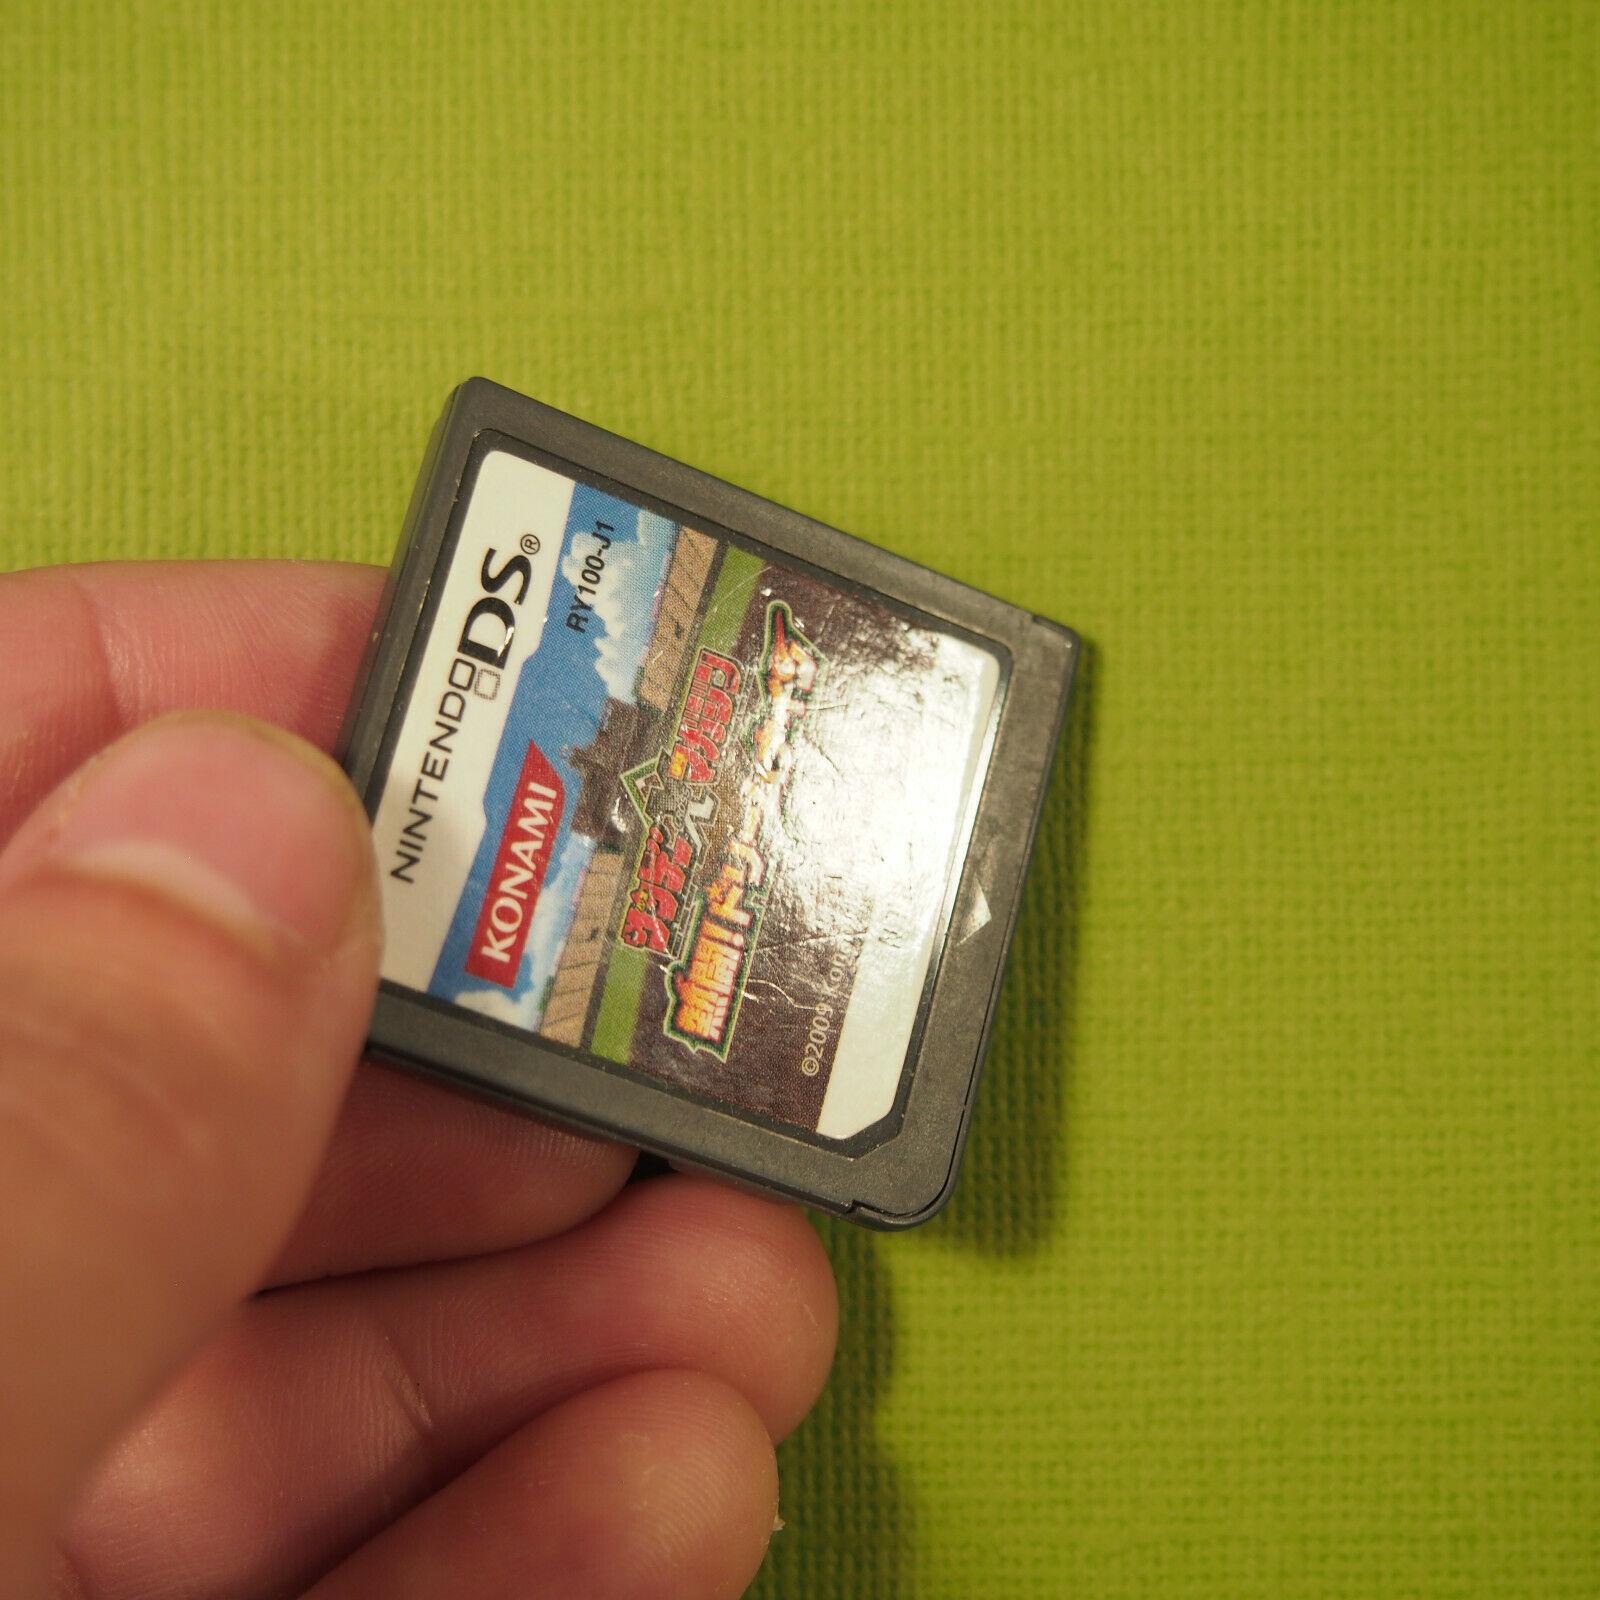 Sunday x Magazine: Nettou! Dream Nine (Nintendo DS, 2009) Japan